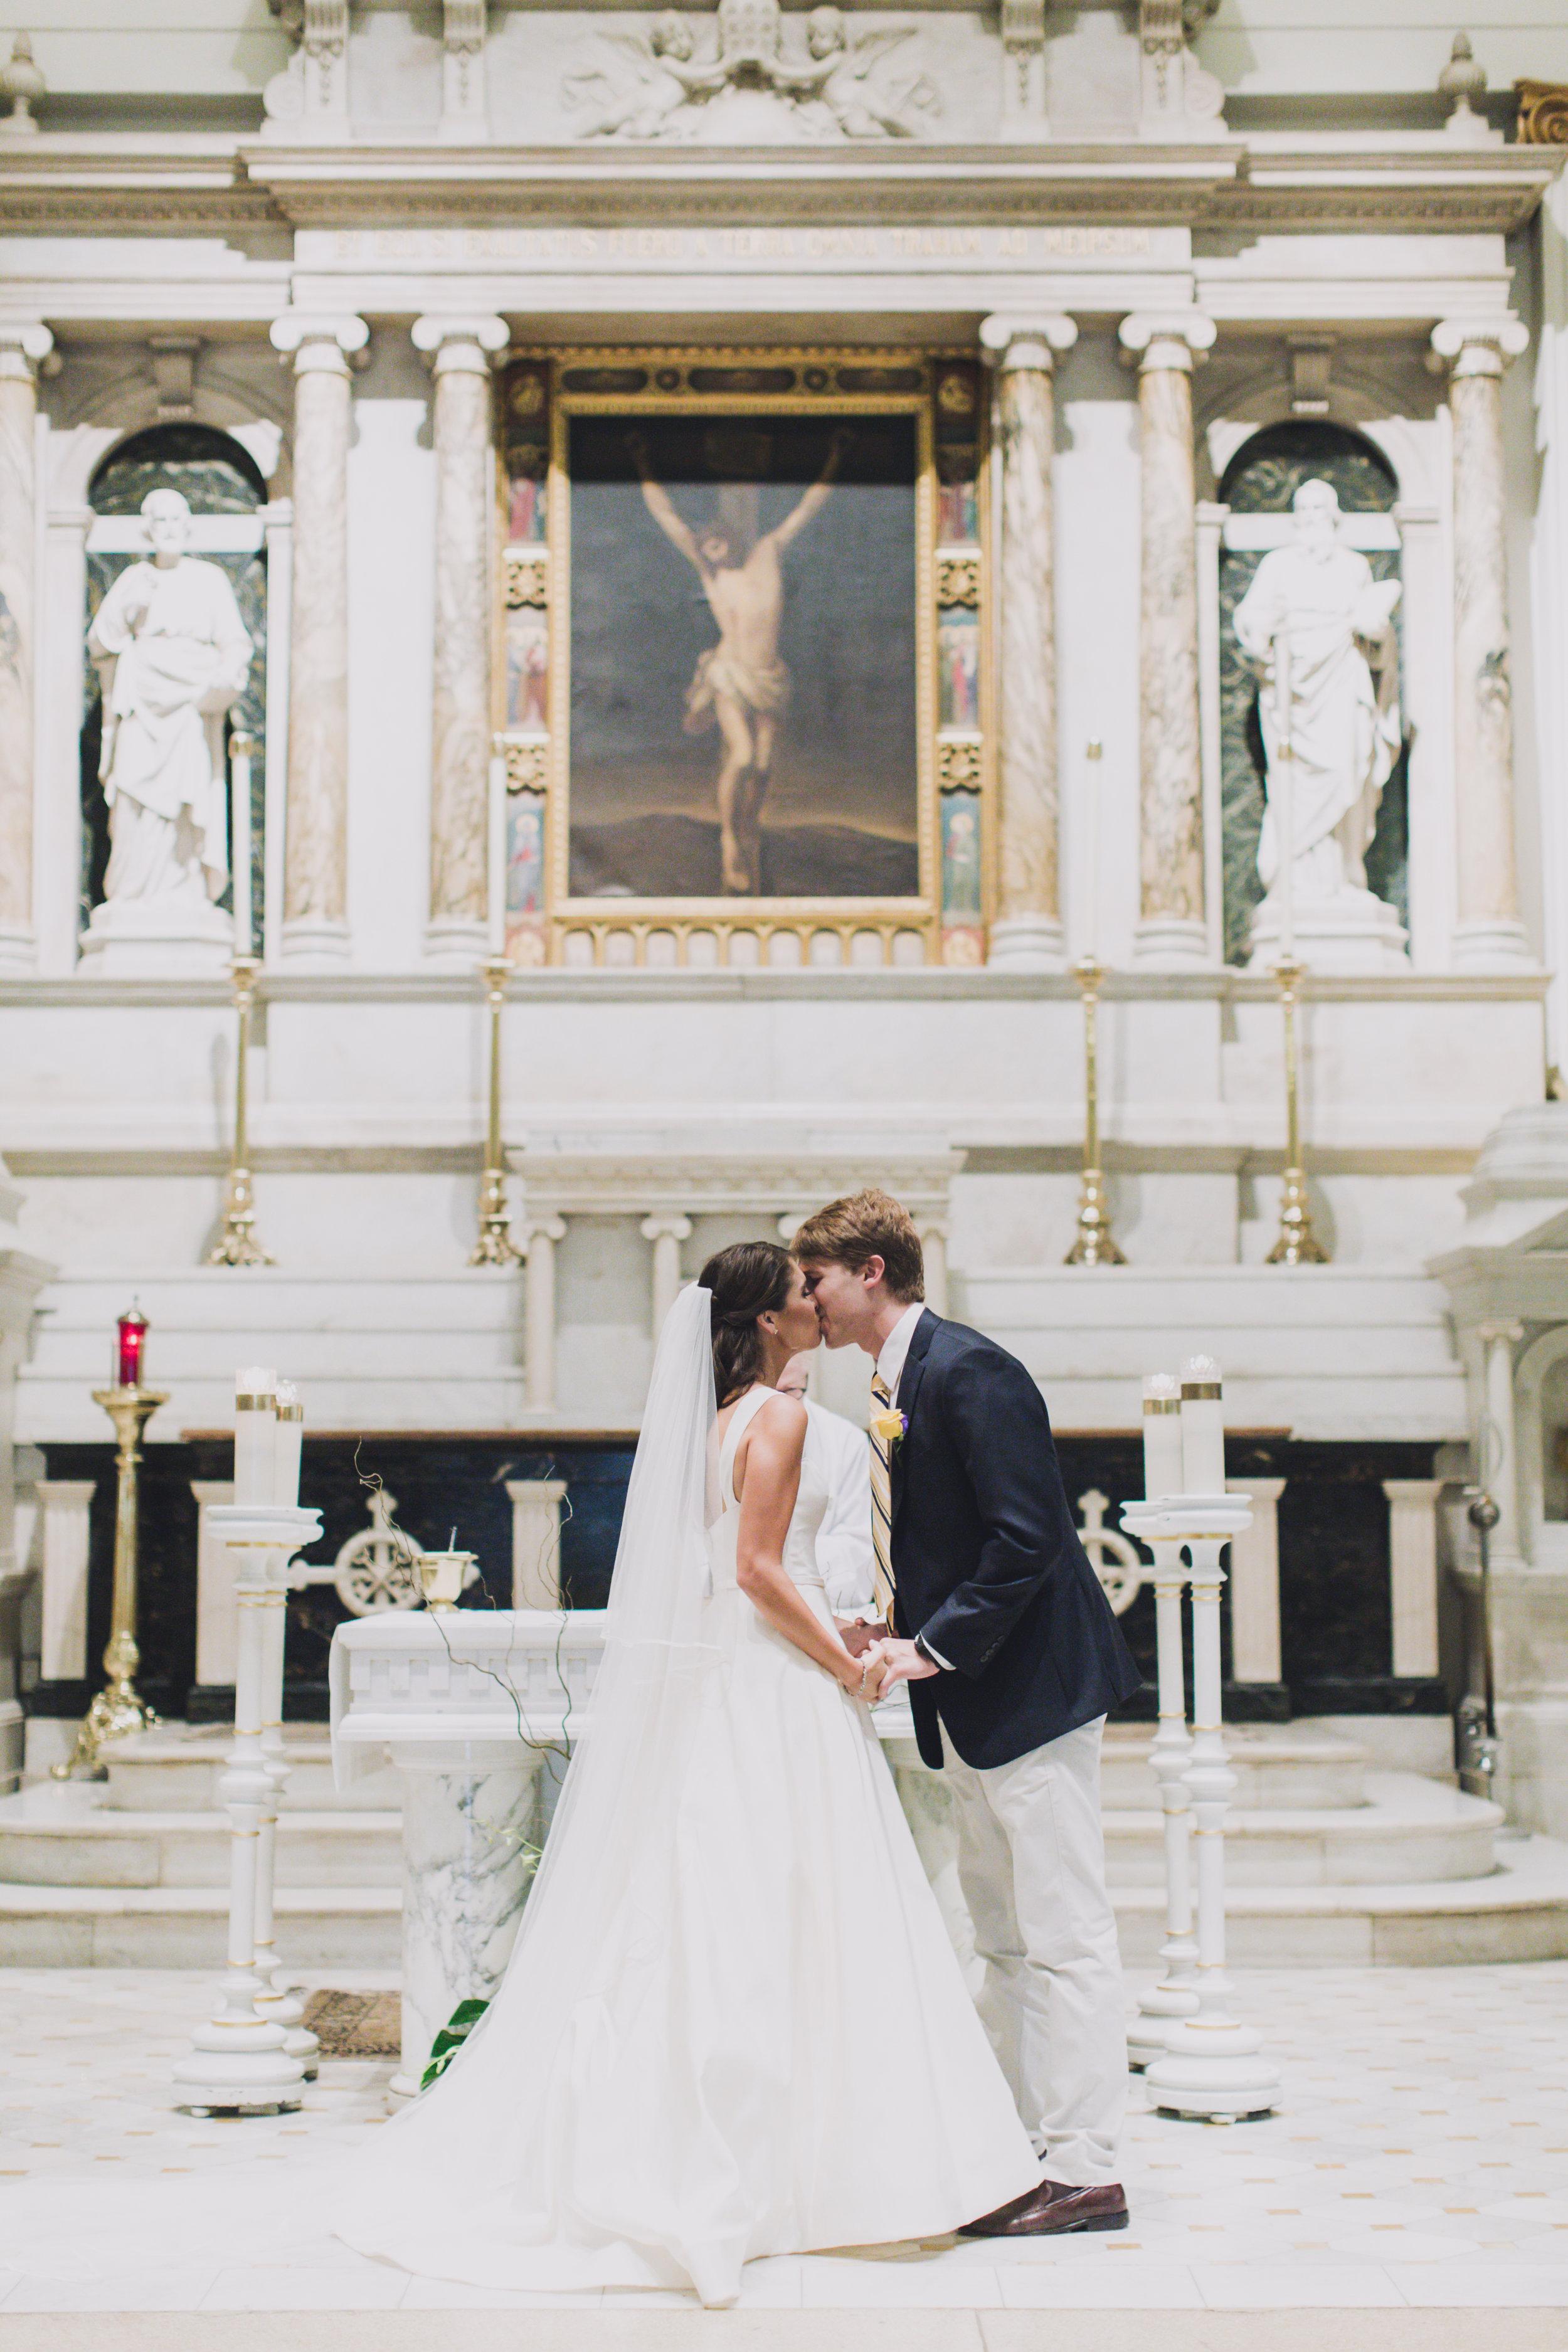 Madeleine_Matt_Wedding_Slideshow_Jpegs-076.jpg